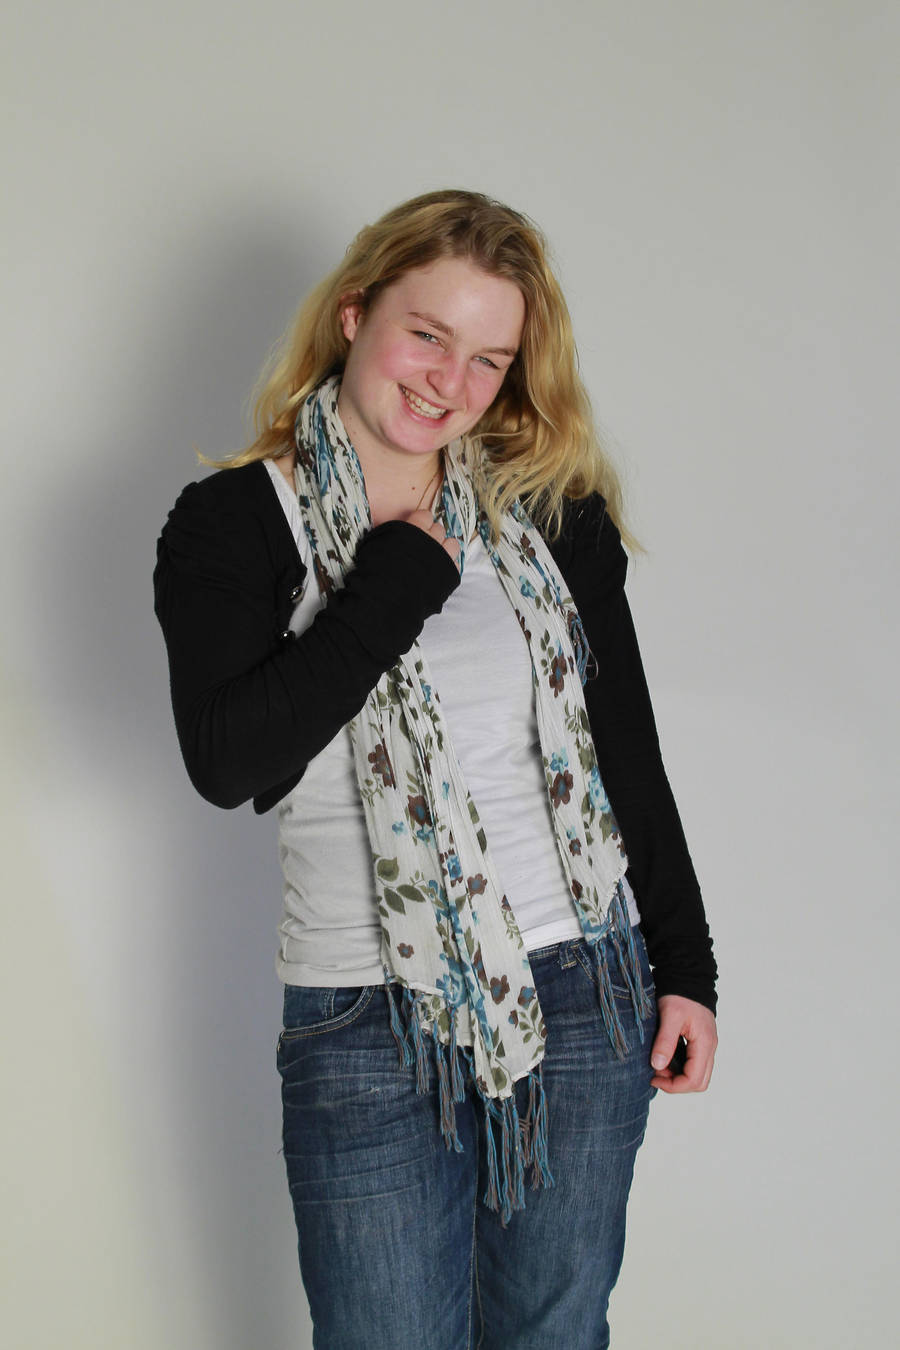 Makkialientje's Profile Picture